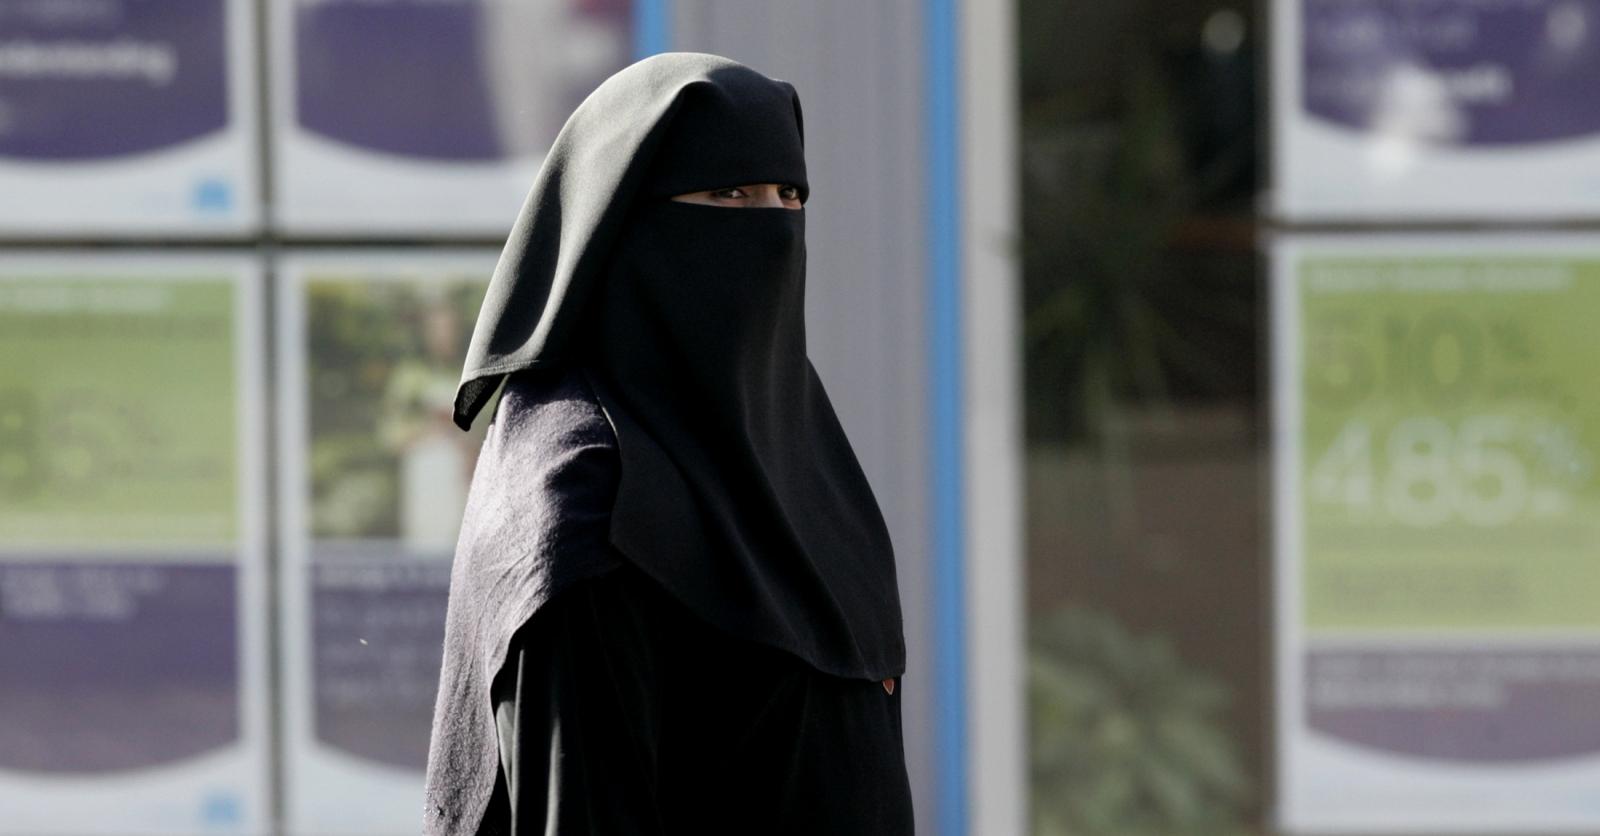 A Muslim woman wearing a niqab in